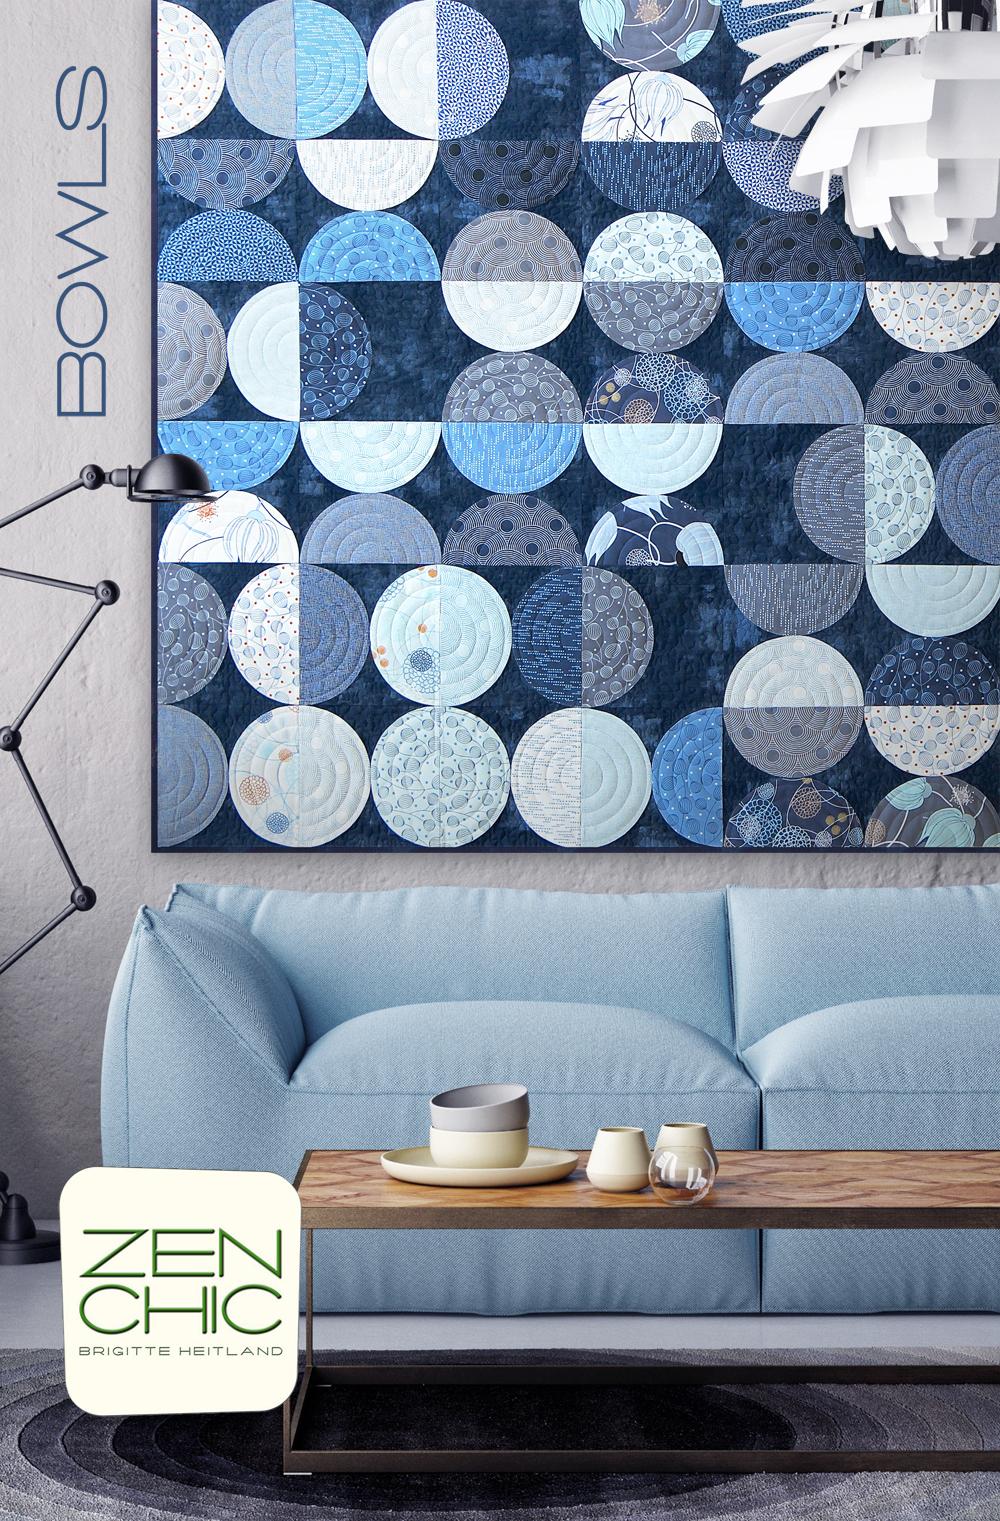 Farbstoff True Blue Zen Chic Collection For Quilt